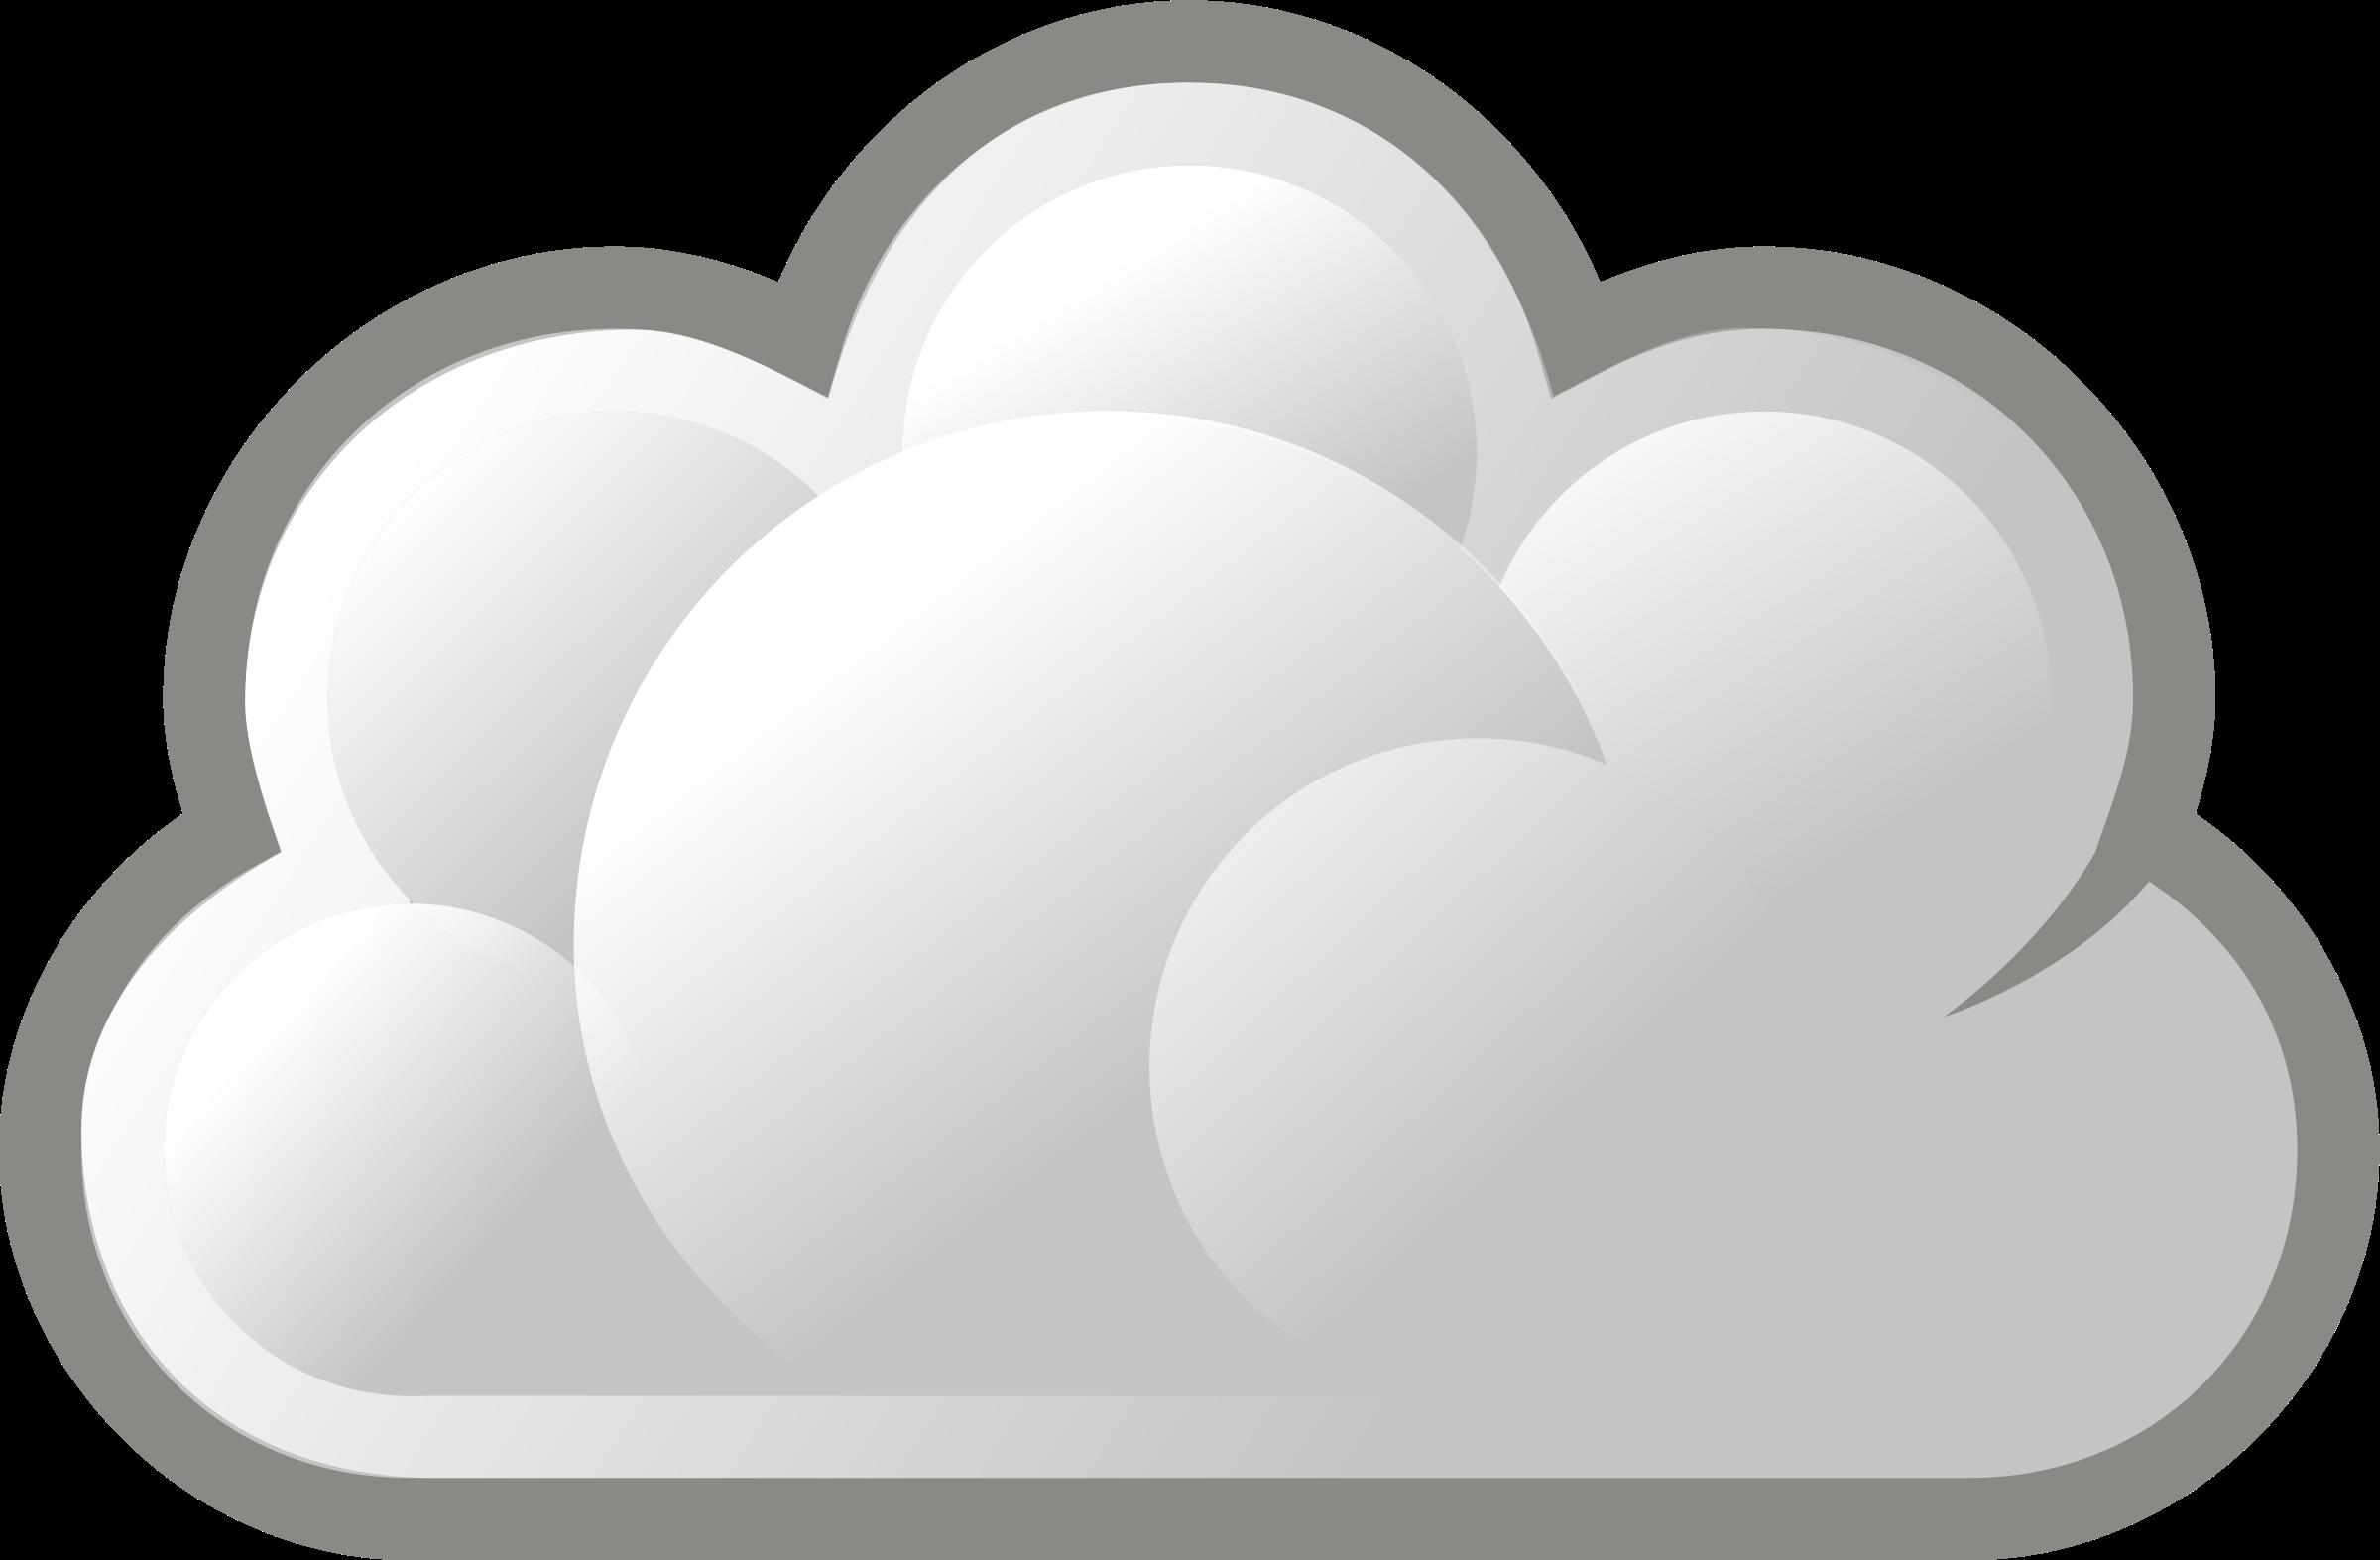 Clipart clouds pdf. Internet cloud frames illustrations